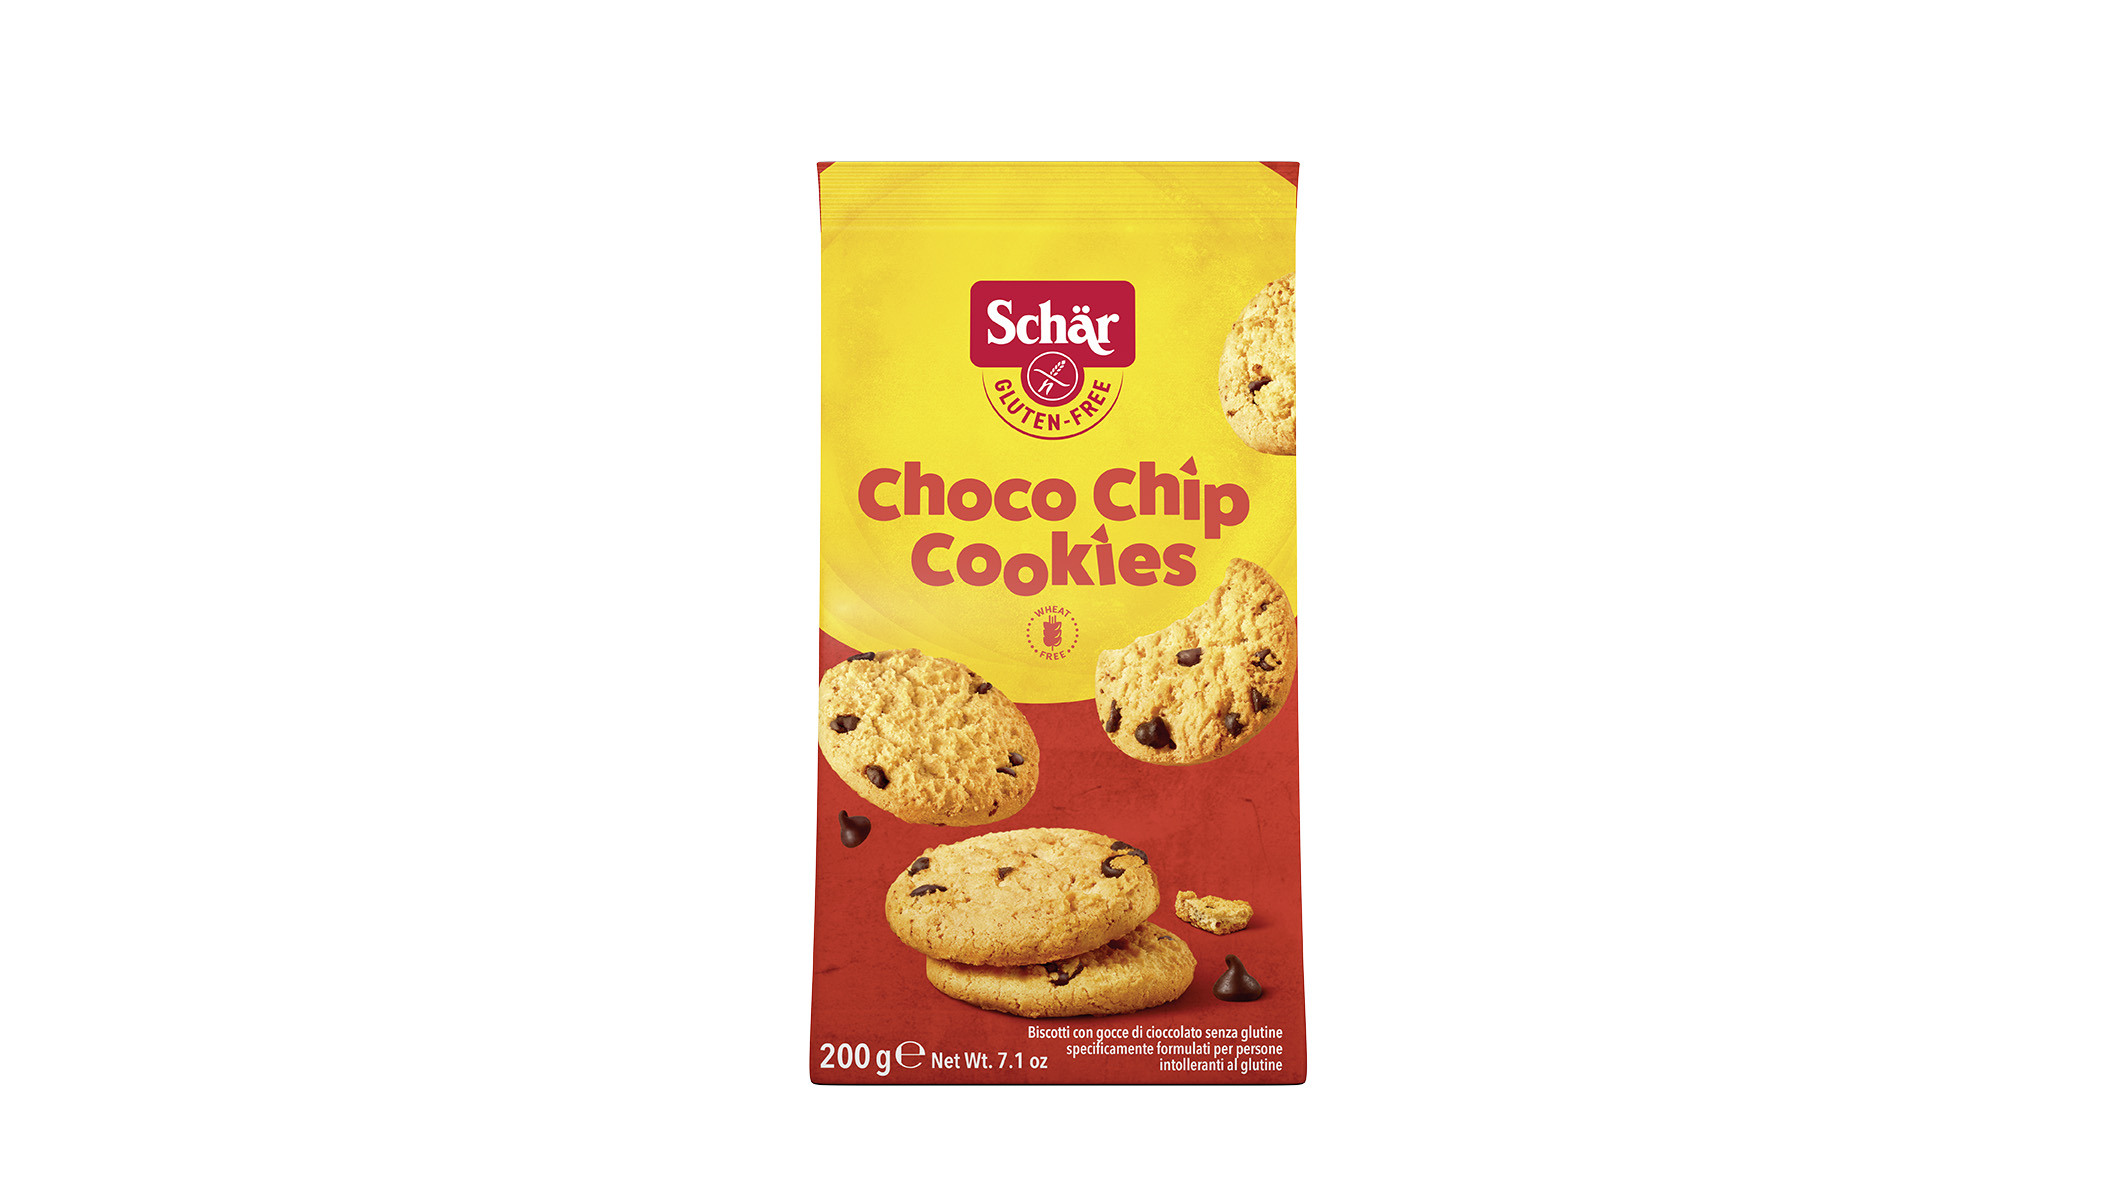 Brezglutenski ameriški piškoti s koščki čokolade – Choco Chip Cookies